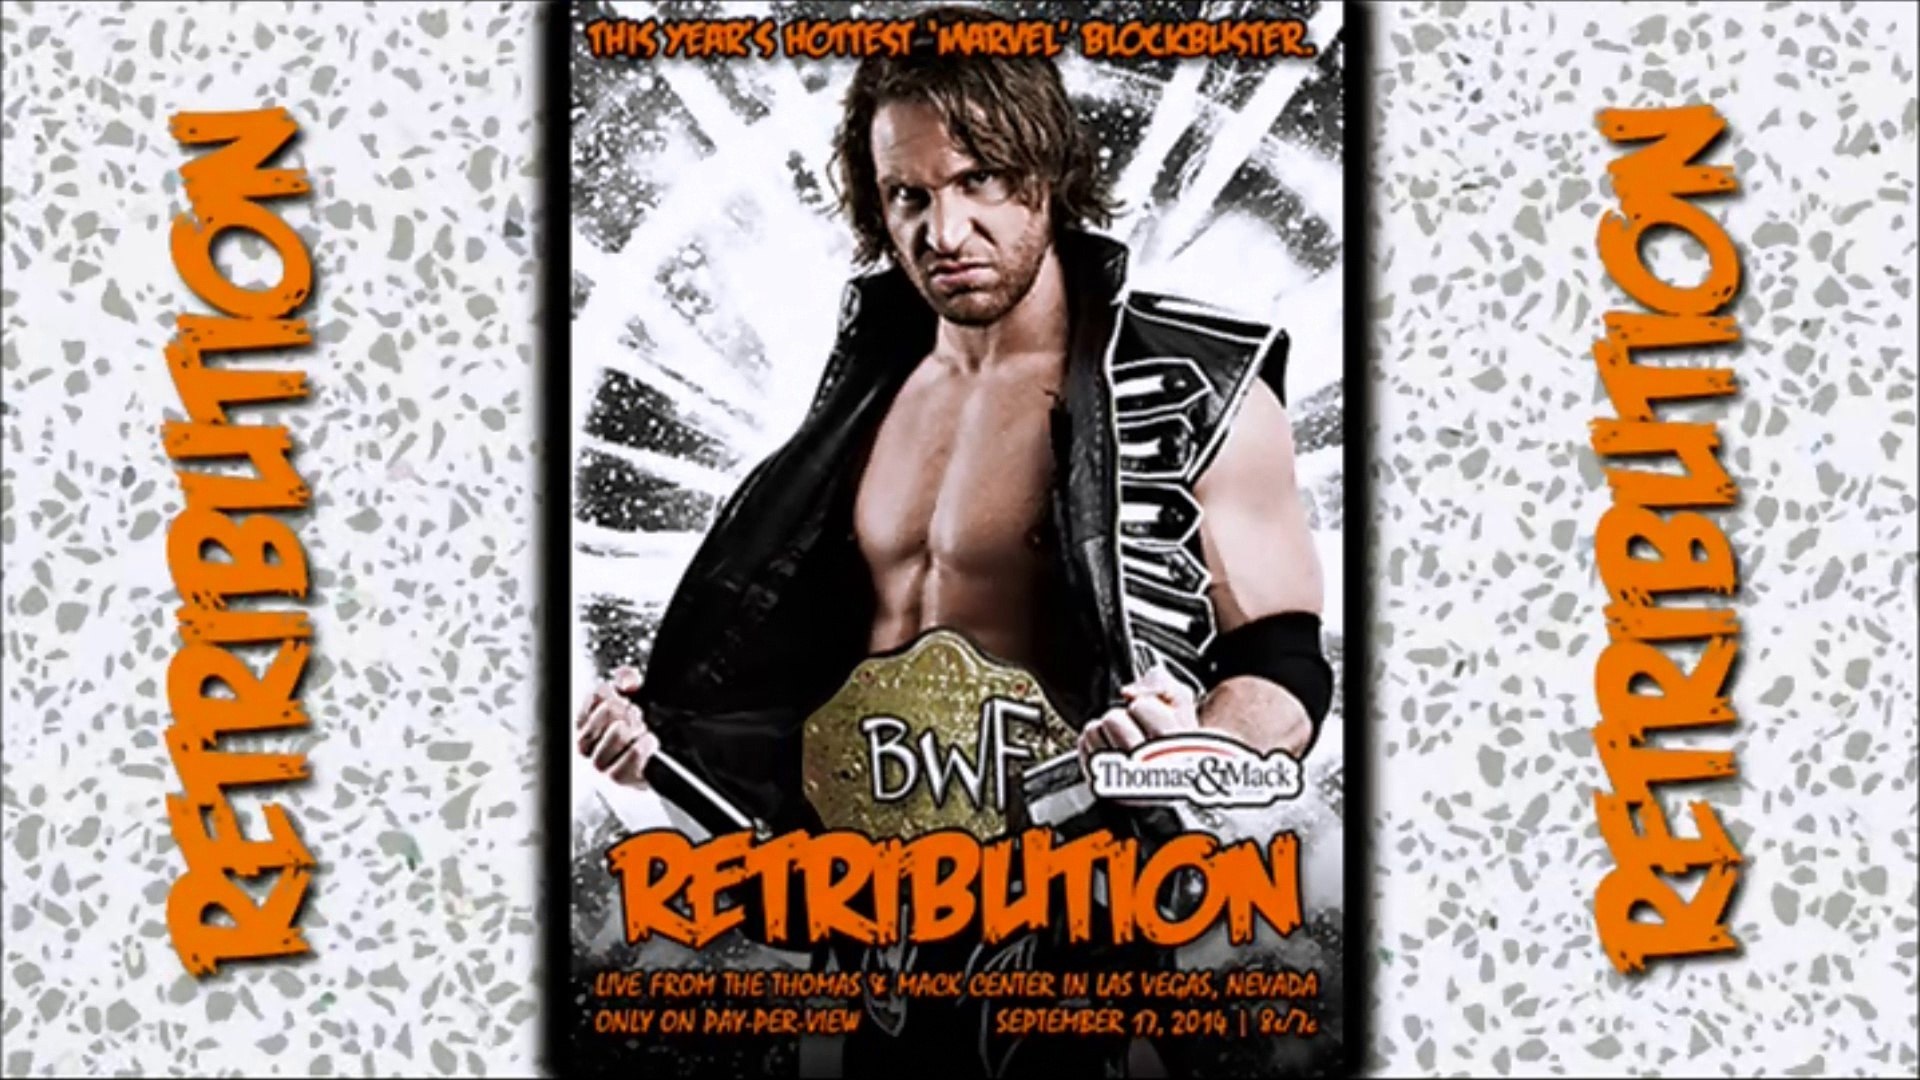 BWF Retribution 2014 Theme